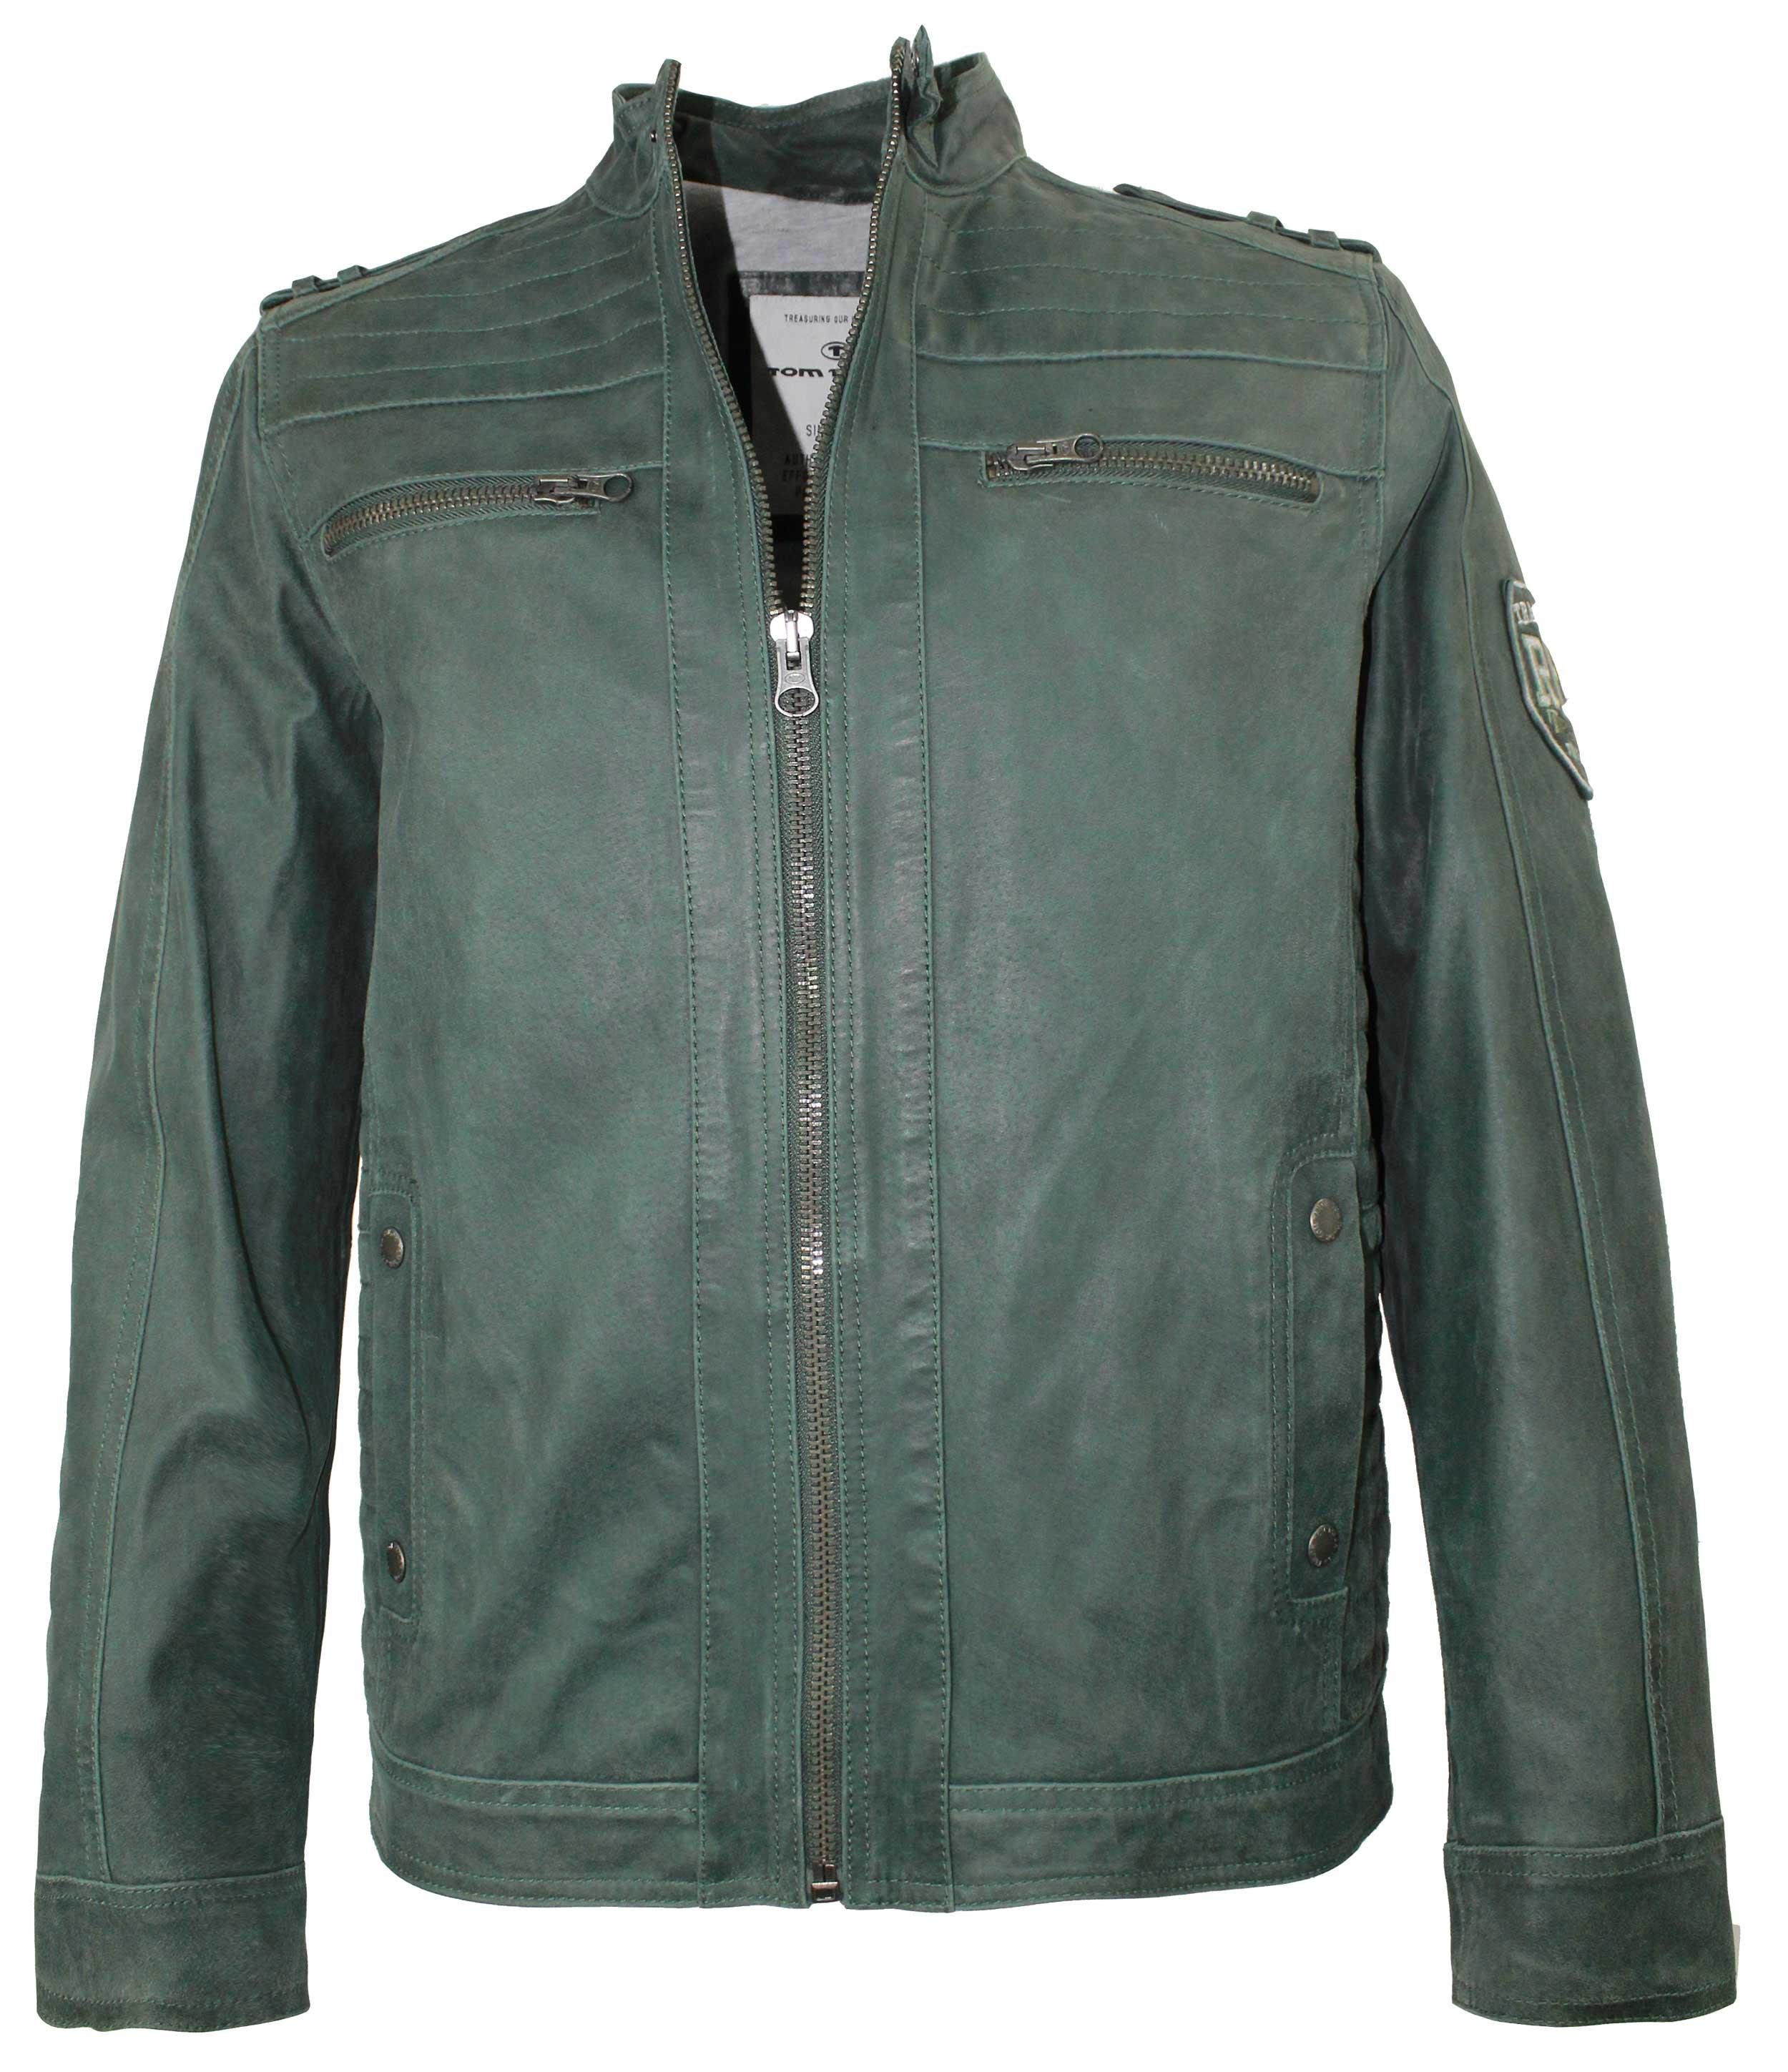 Details zu Tom Tailor Herren Lederjacke echtes Leder grün